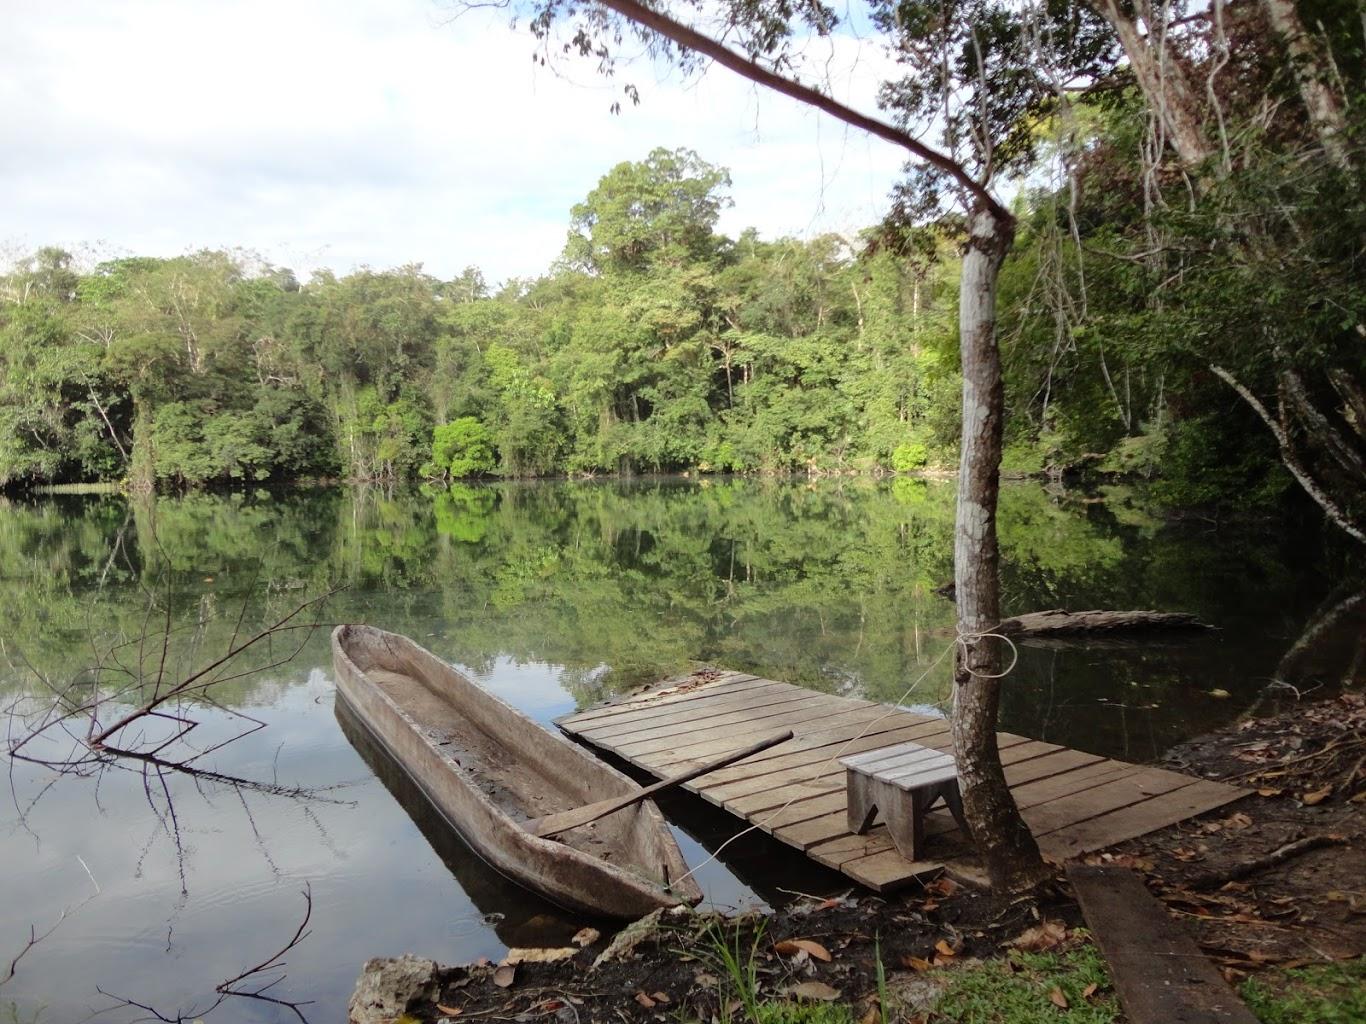 Santuario del Cocodrilo Tres Lagunas Chiapas 2